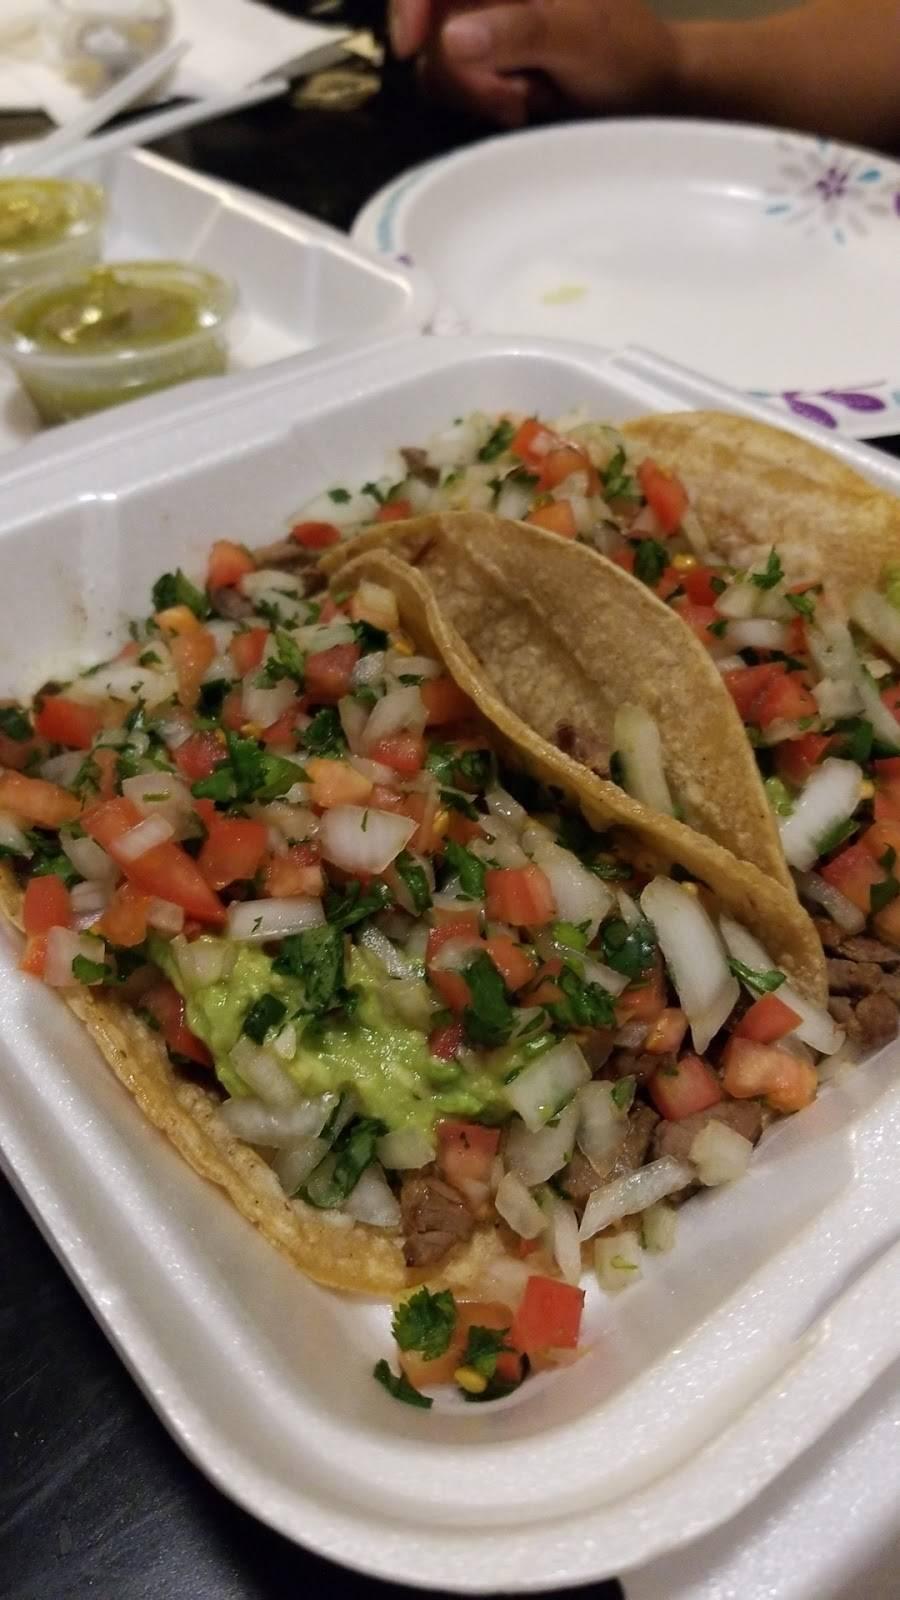 Taco Salsa | restaurant | 4701 N Academy Blvd, Colorado Springs, CO 80918, USA | 7193449150 OR +1 719-344-9150